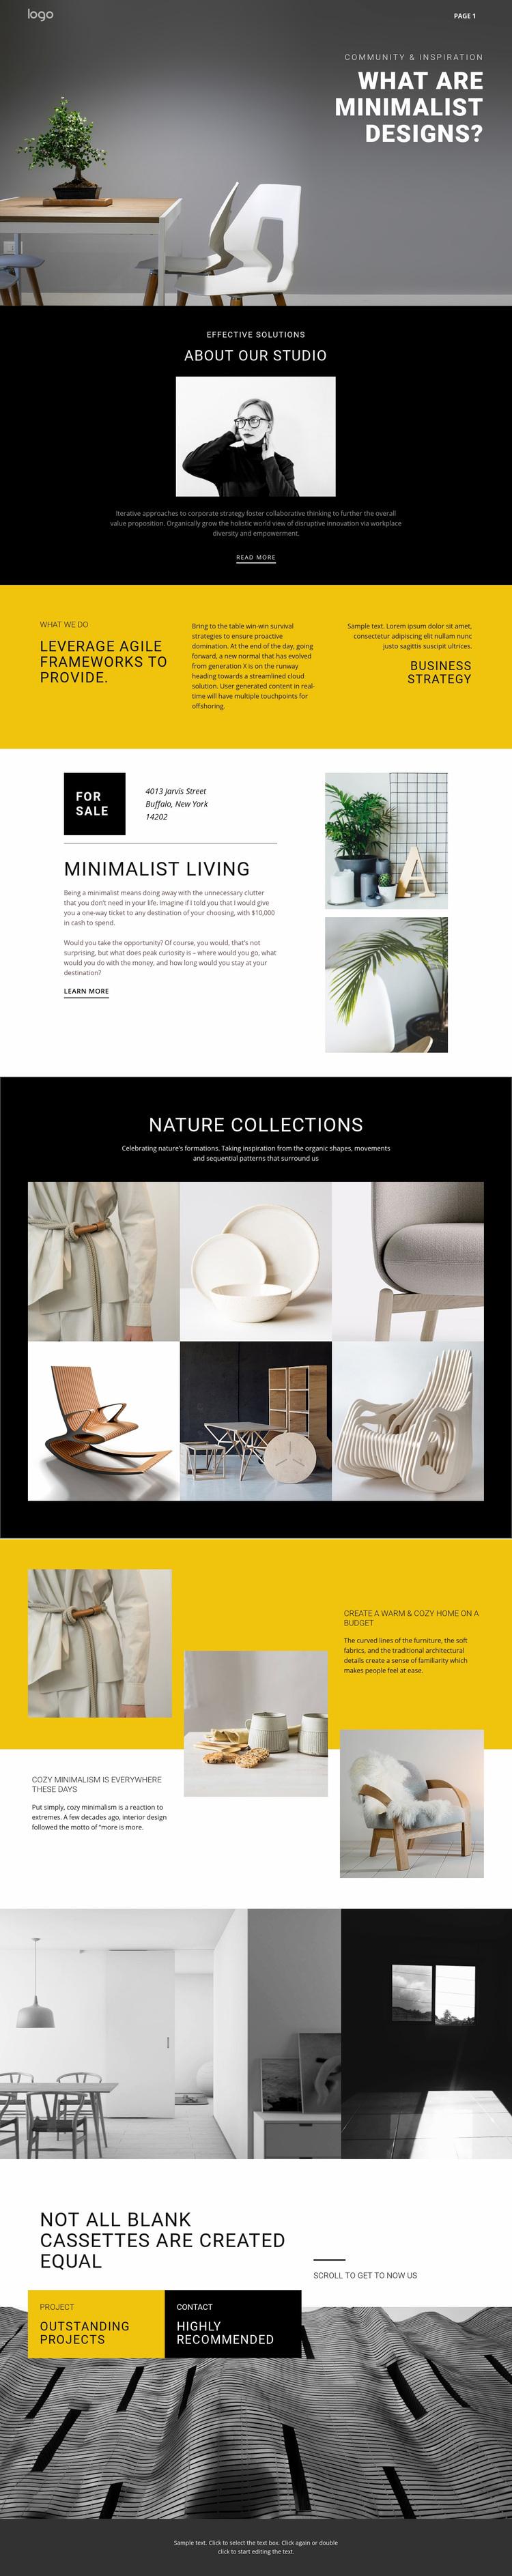 Minimalist designer interiors Web Page Designer